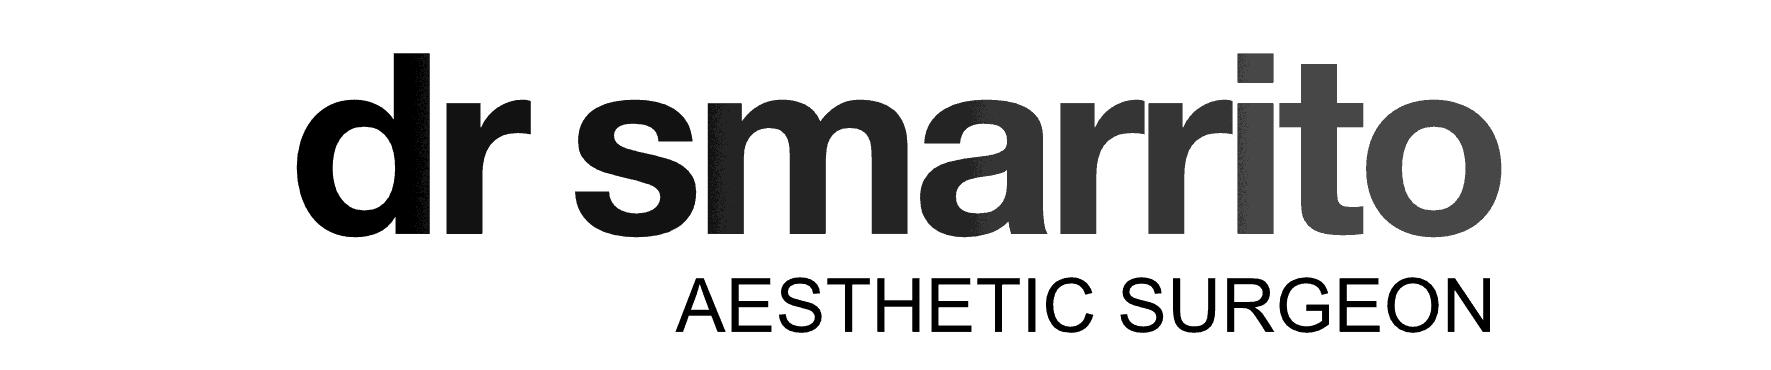 chirurgie esthetique suisse